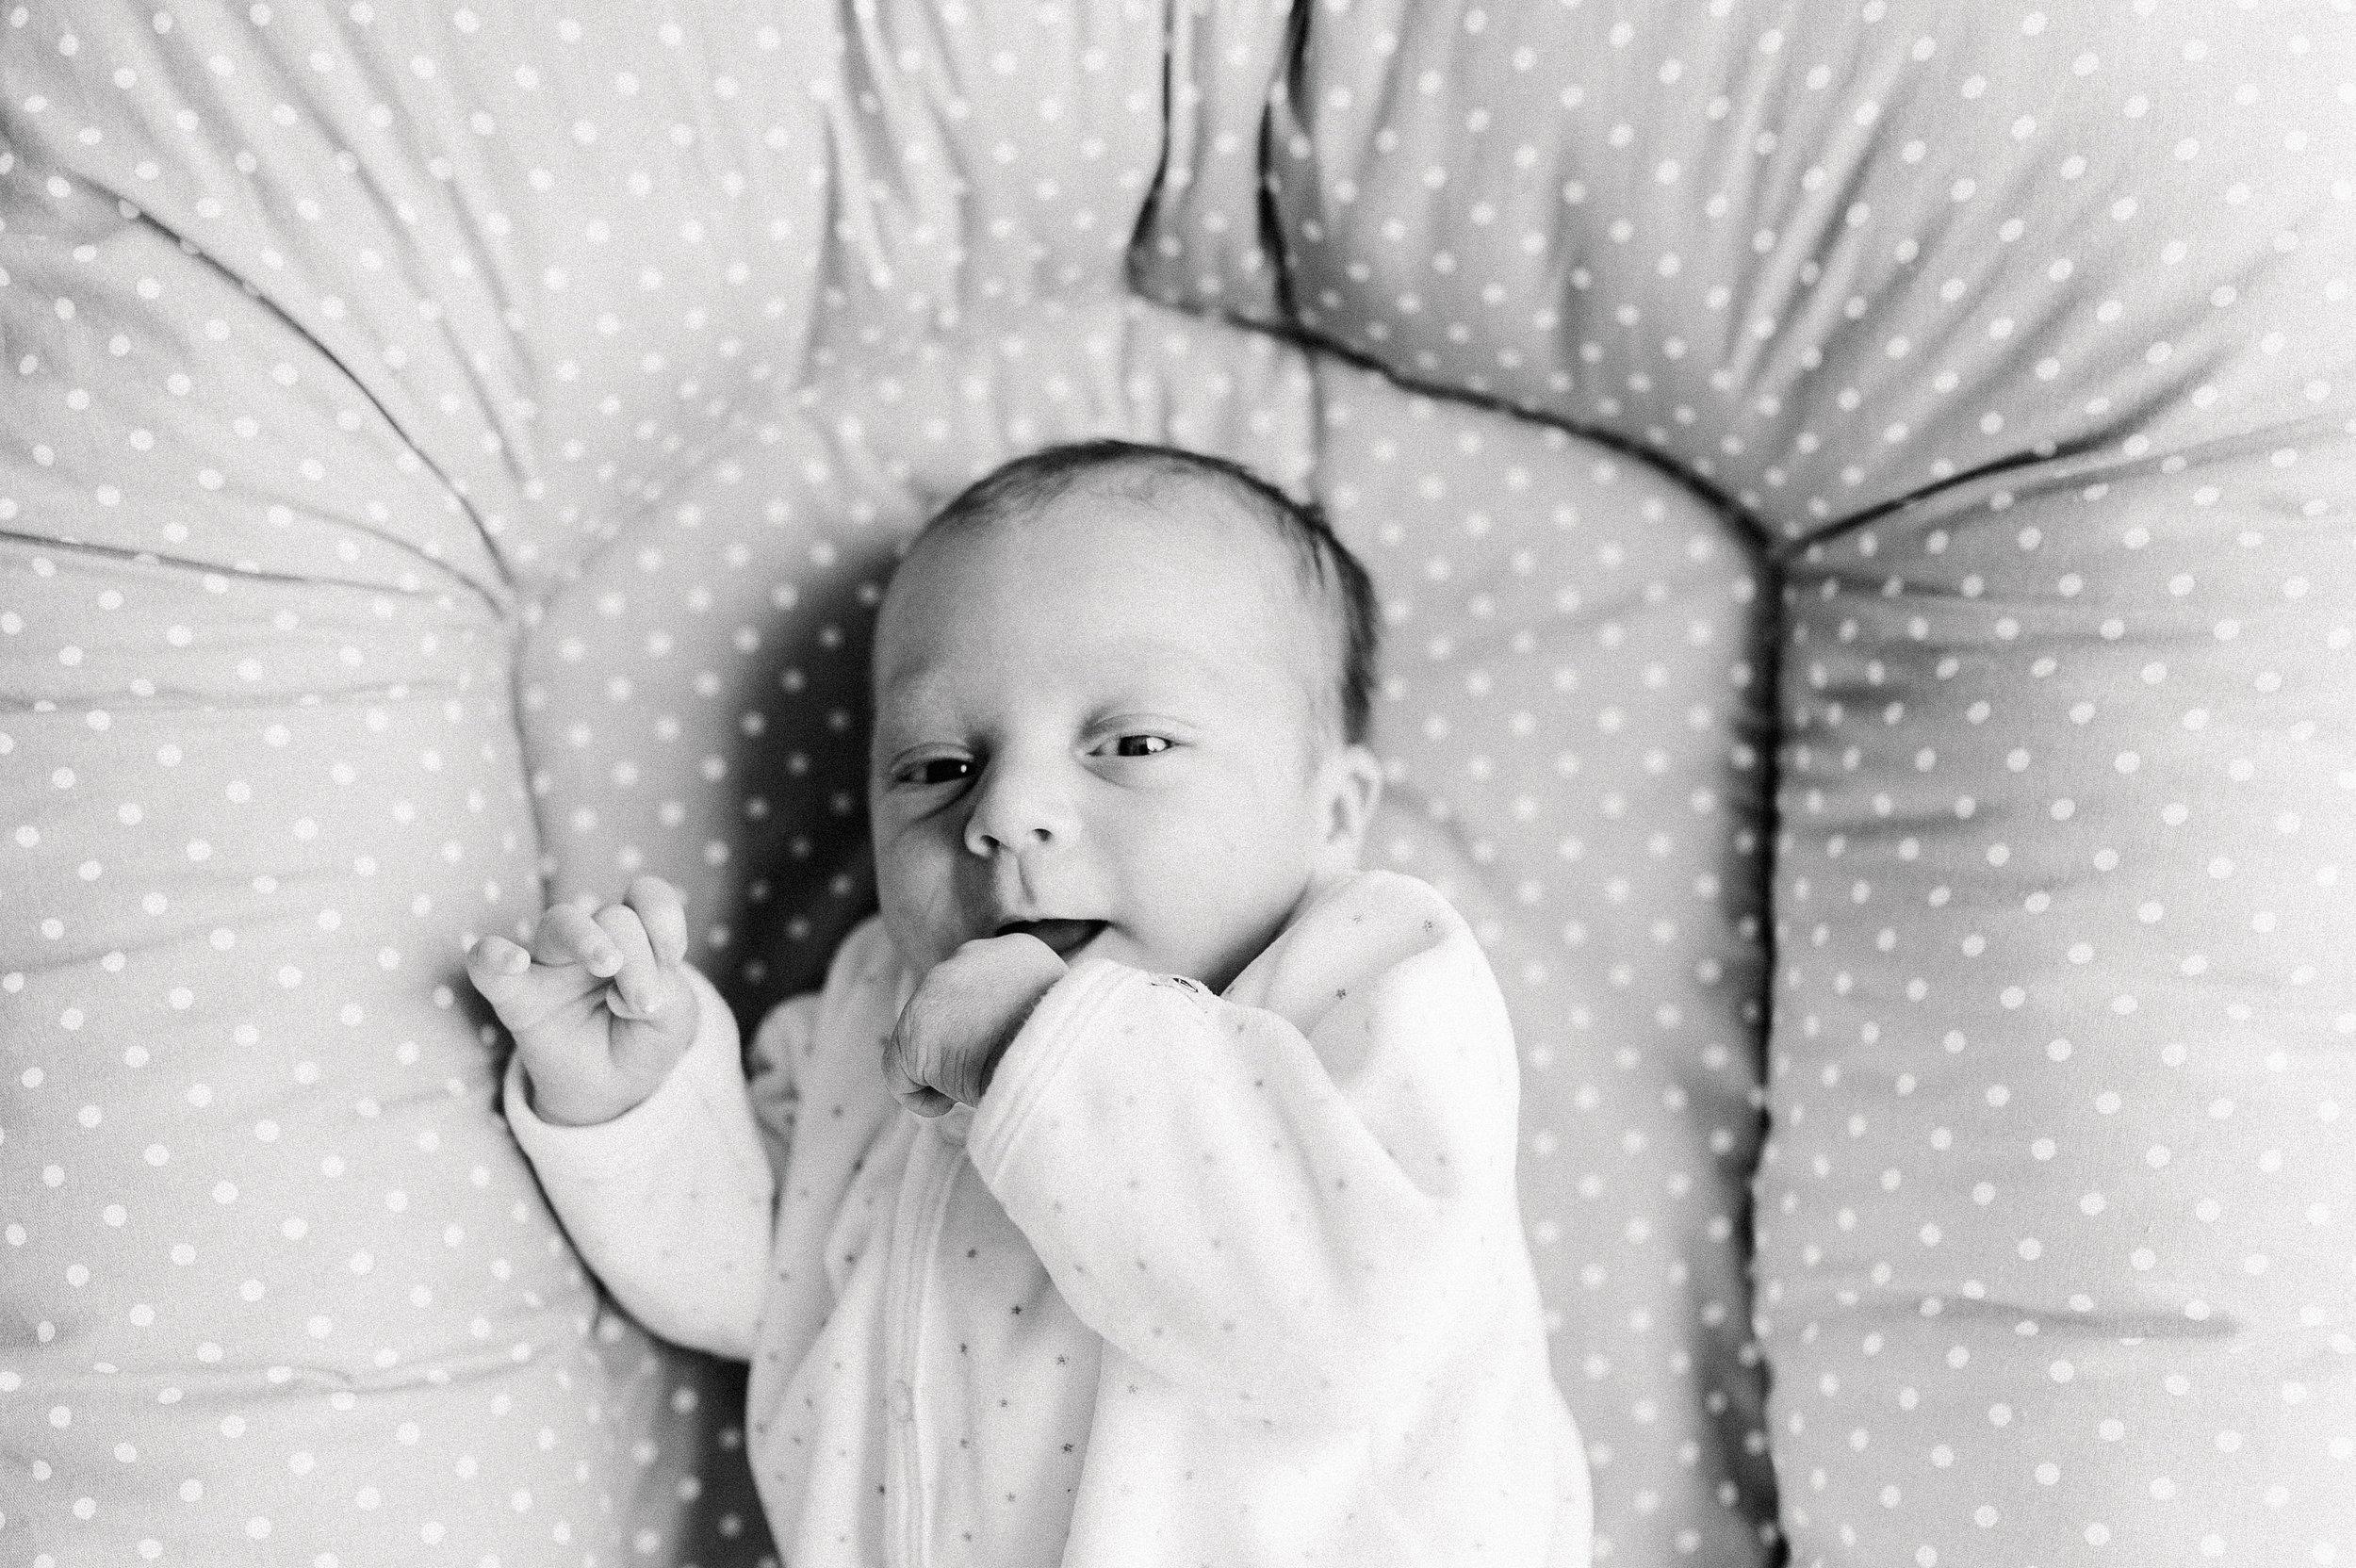 Anna-Hari-Photography-Familienshooting-Neugeborenenshooting-Mannheim-Heidelberg34.jpg